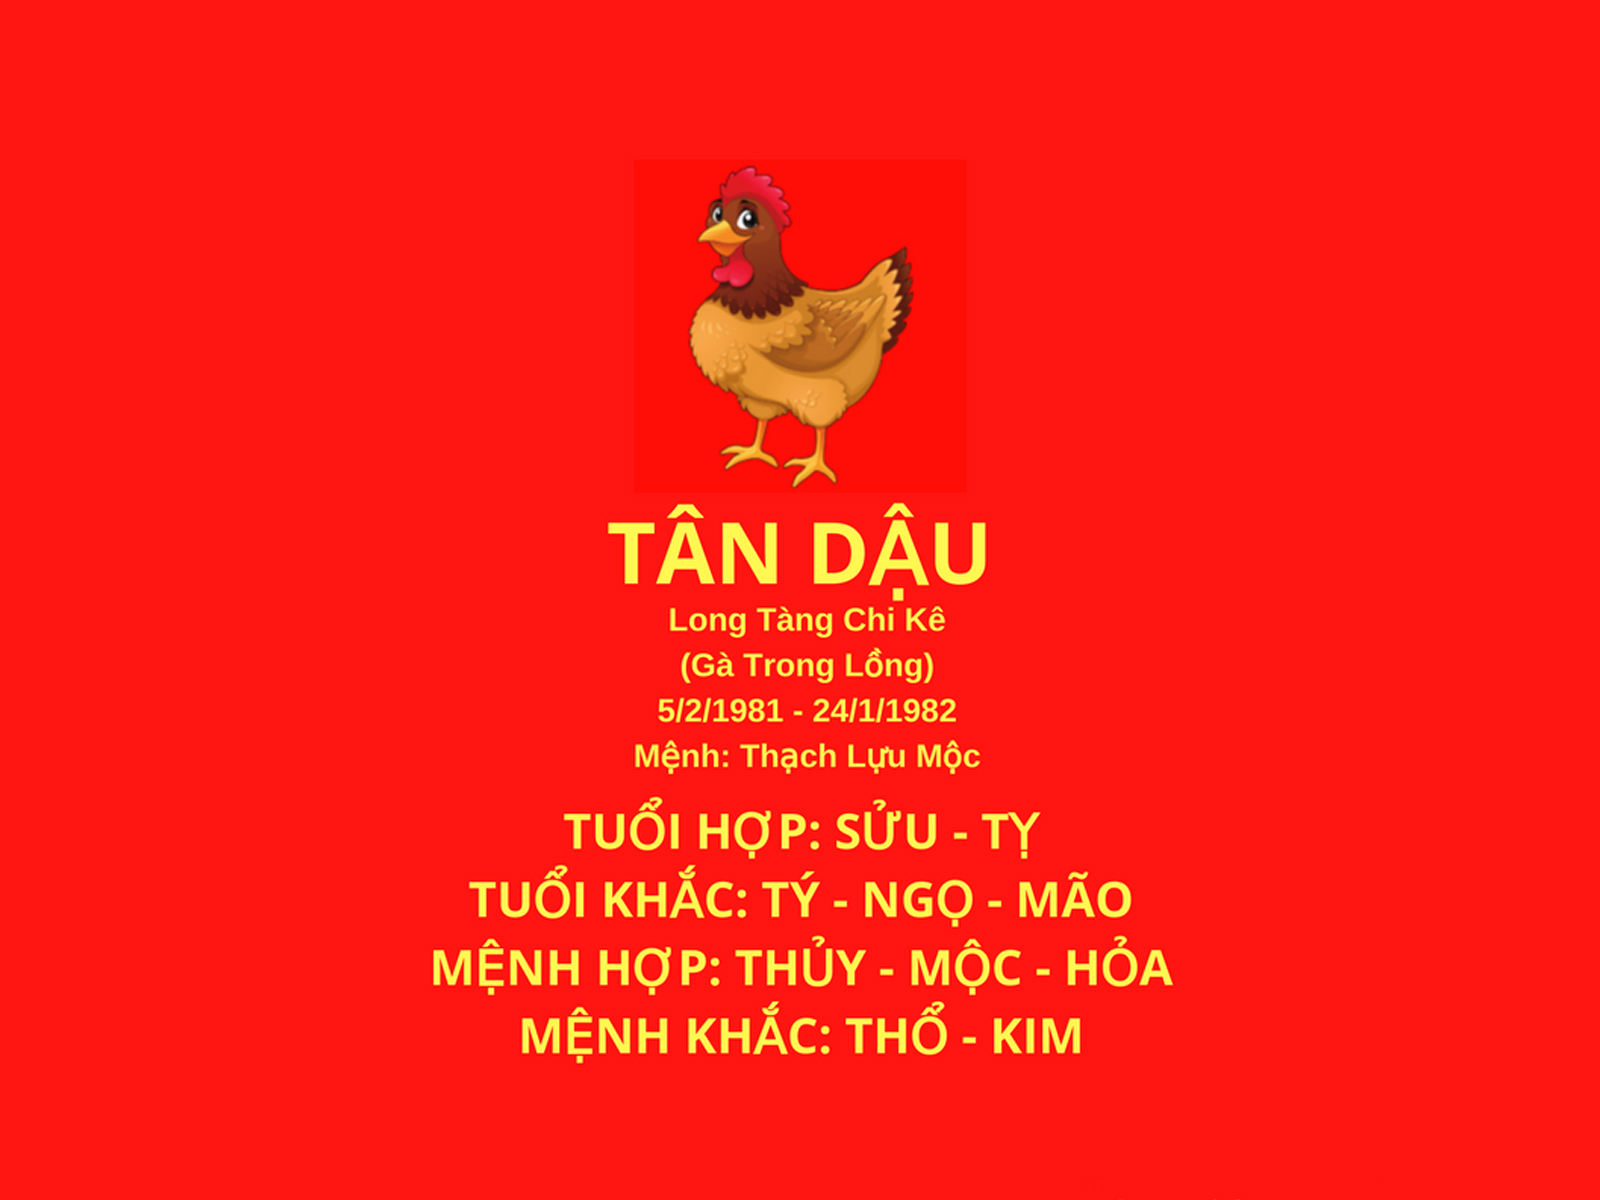 hinh anh chon huong nha tuoi Tan Dau 1981 ruoc tai loc 1